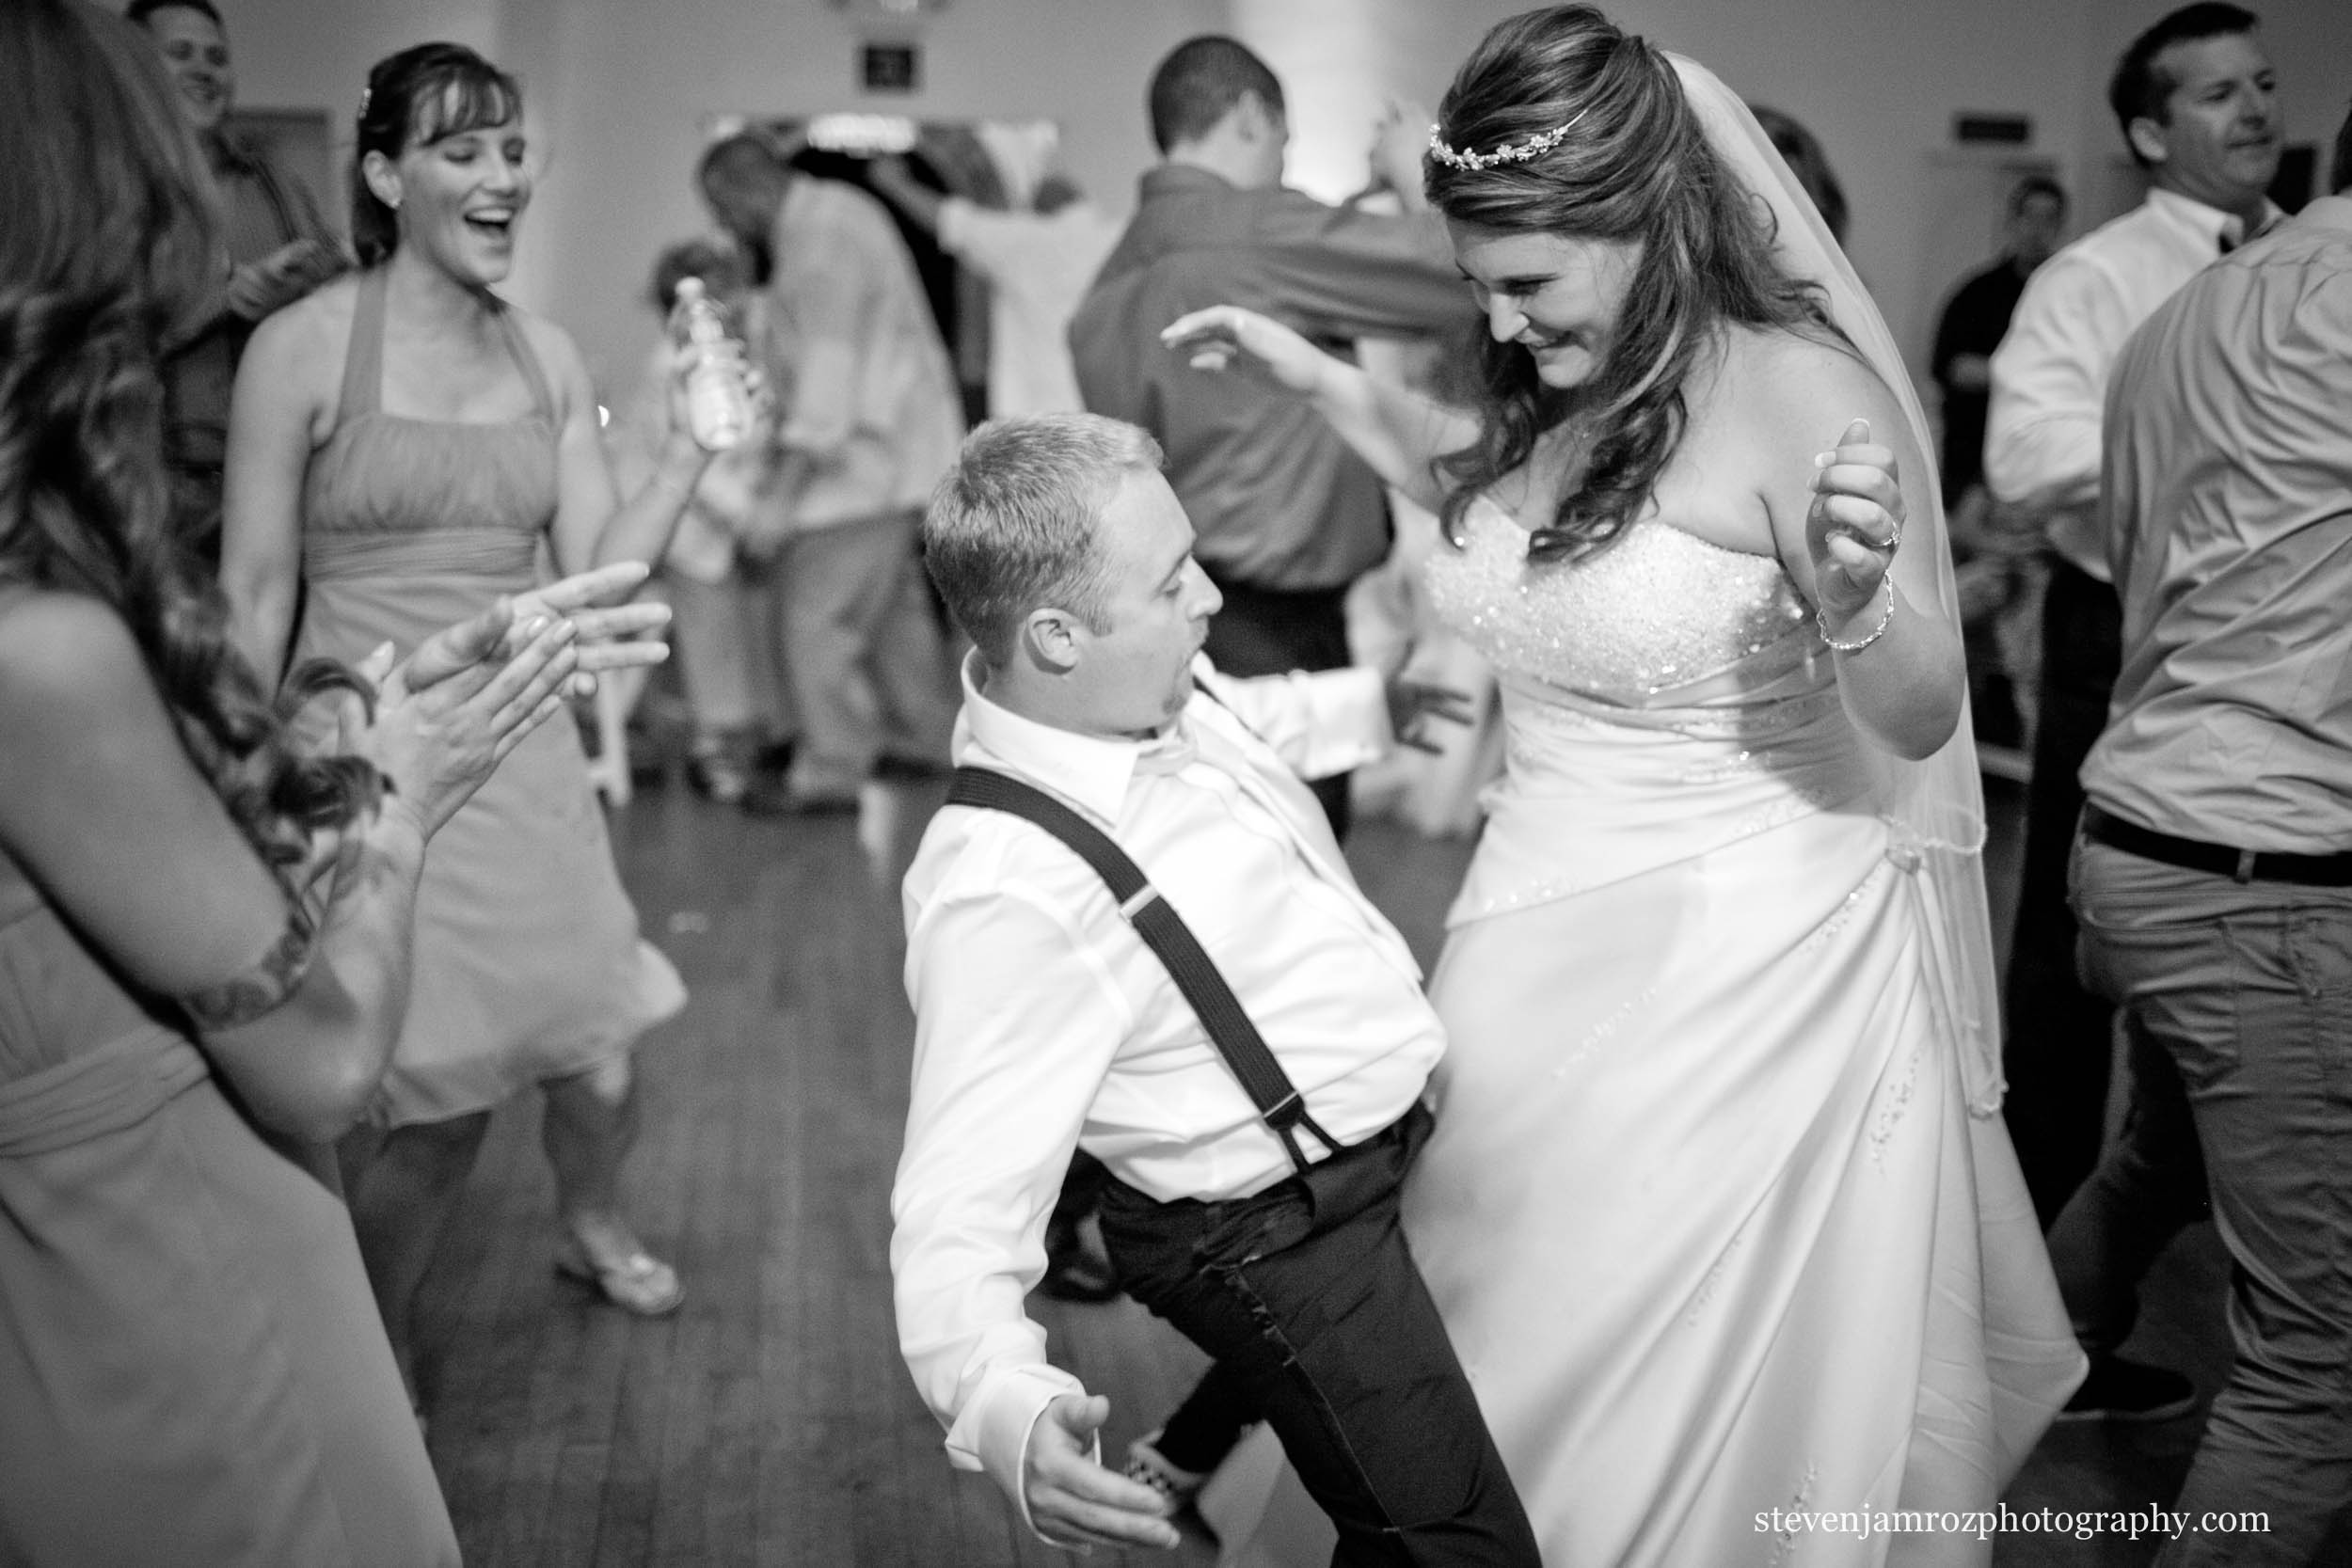 let-loose-wedding-reception-steven-jamroz-photography-0287.jpg